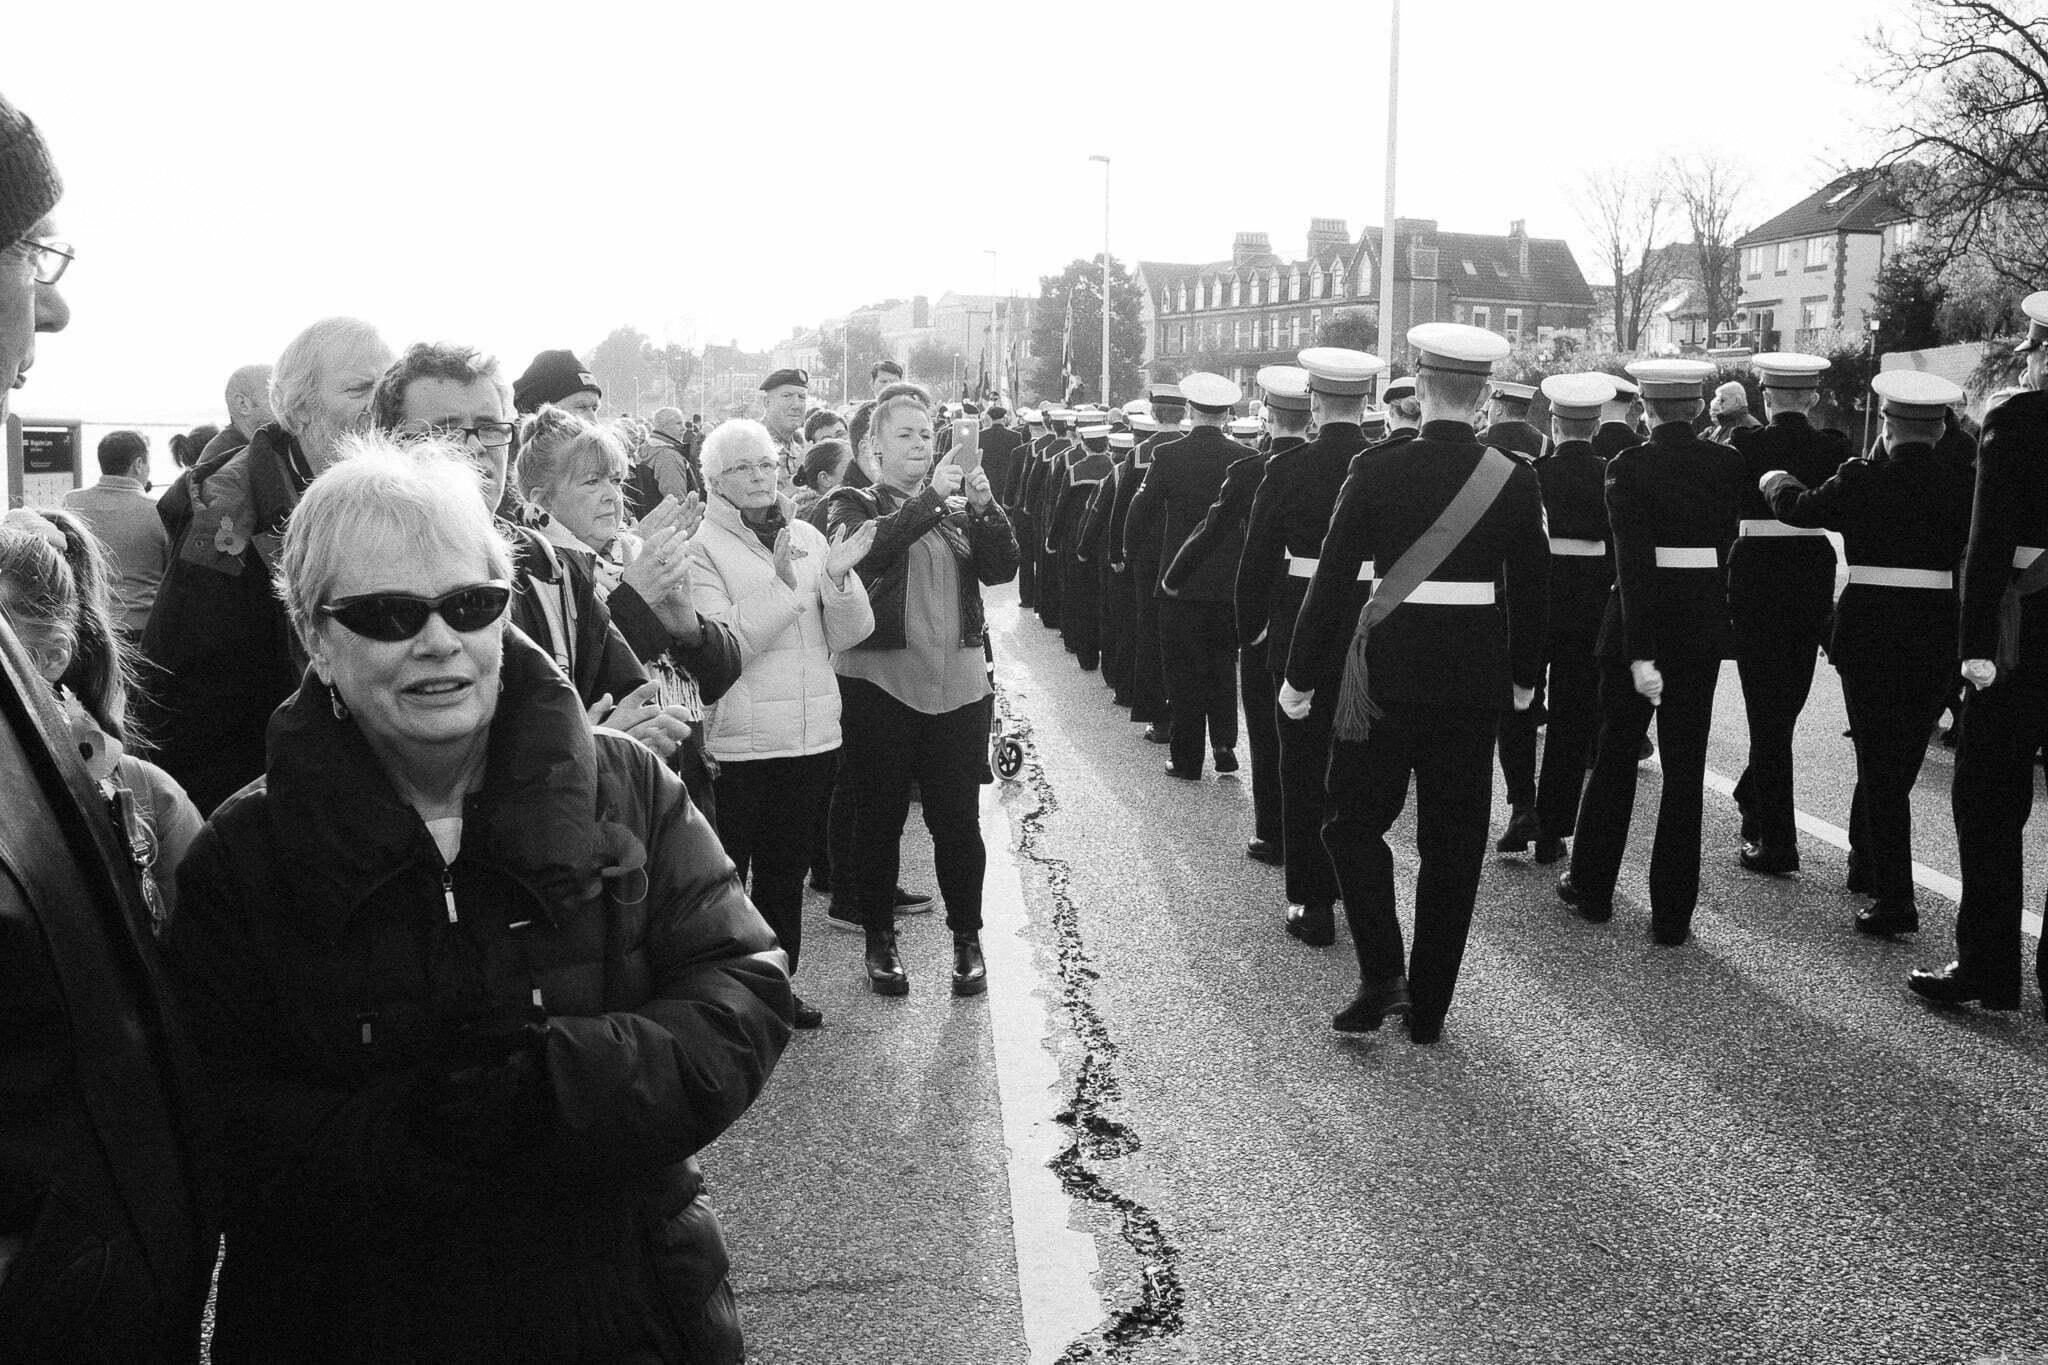 Wallasey Remembrance Sunday Service